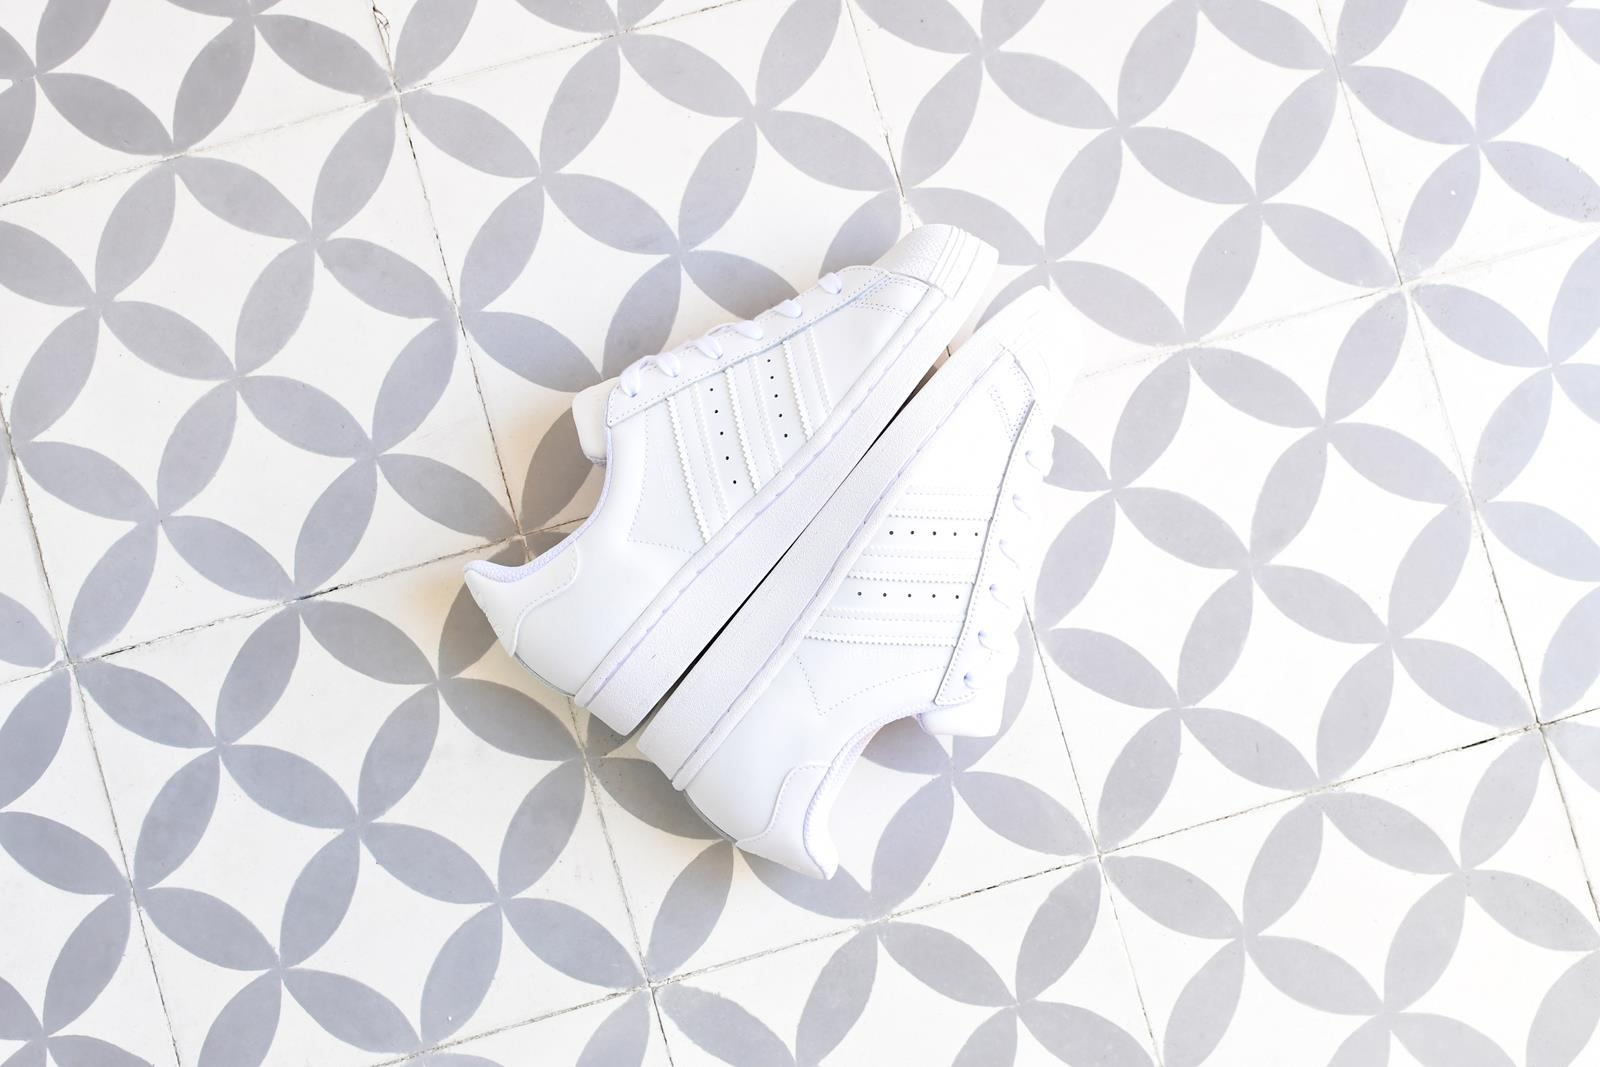 Adidas Superstar Blanco Monocromo